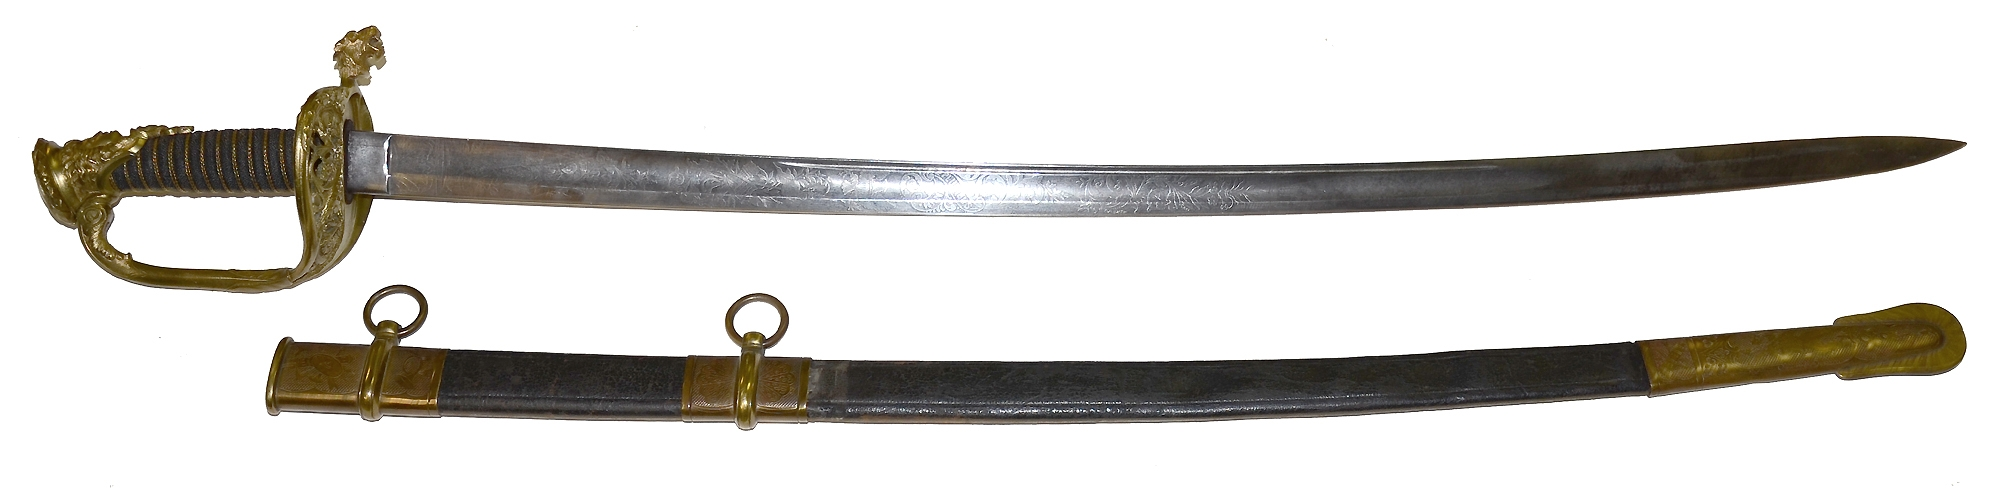 NON-REGULATION M1850 FOOT OFFICER'S SWORD — Horse Soldier